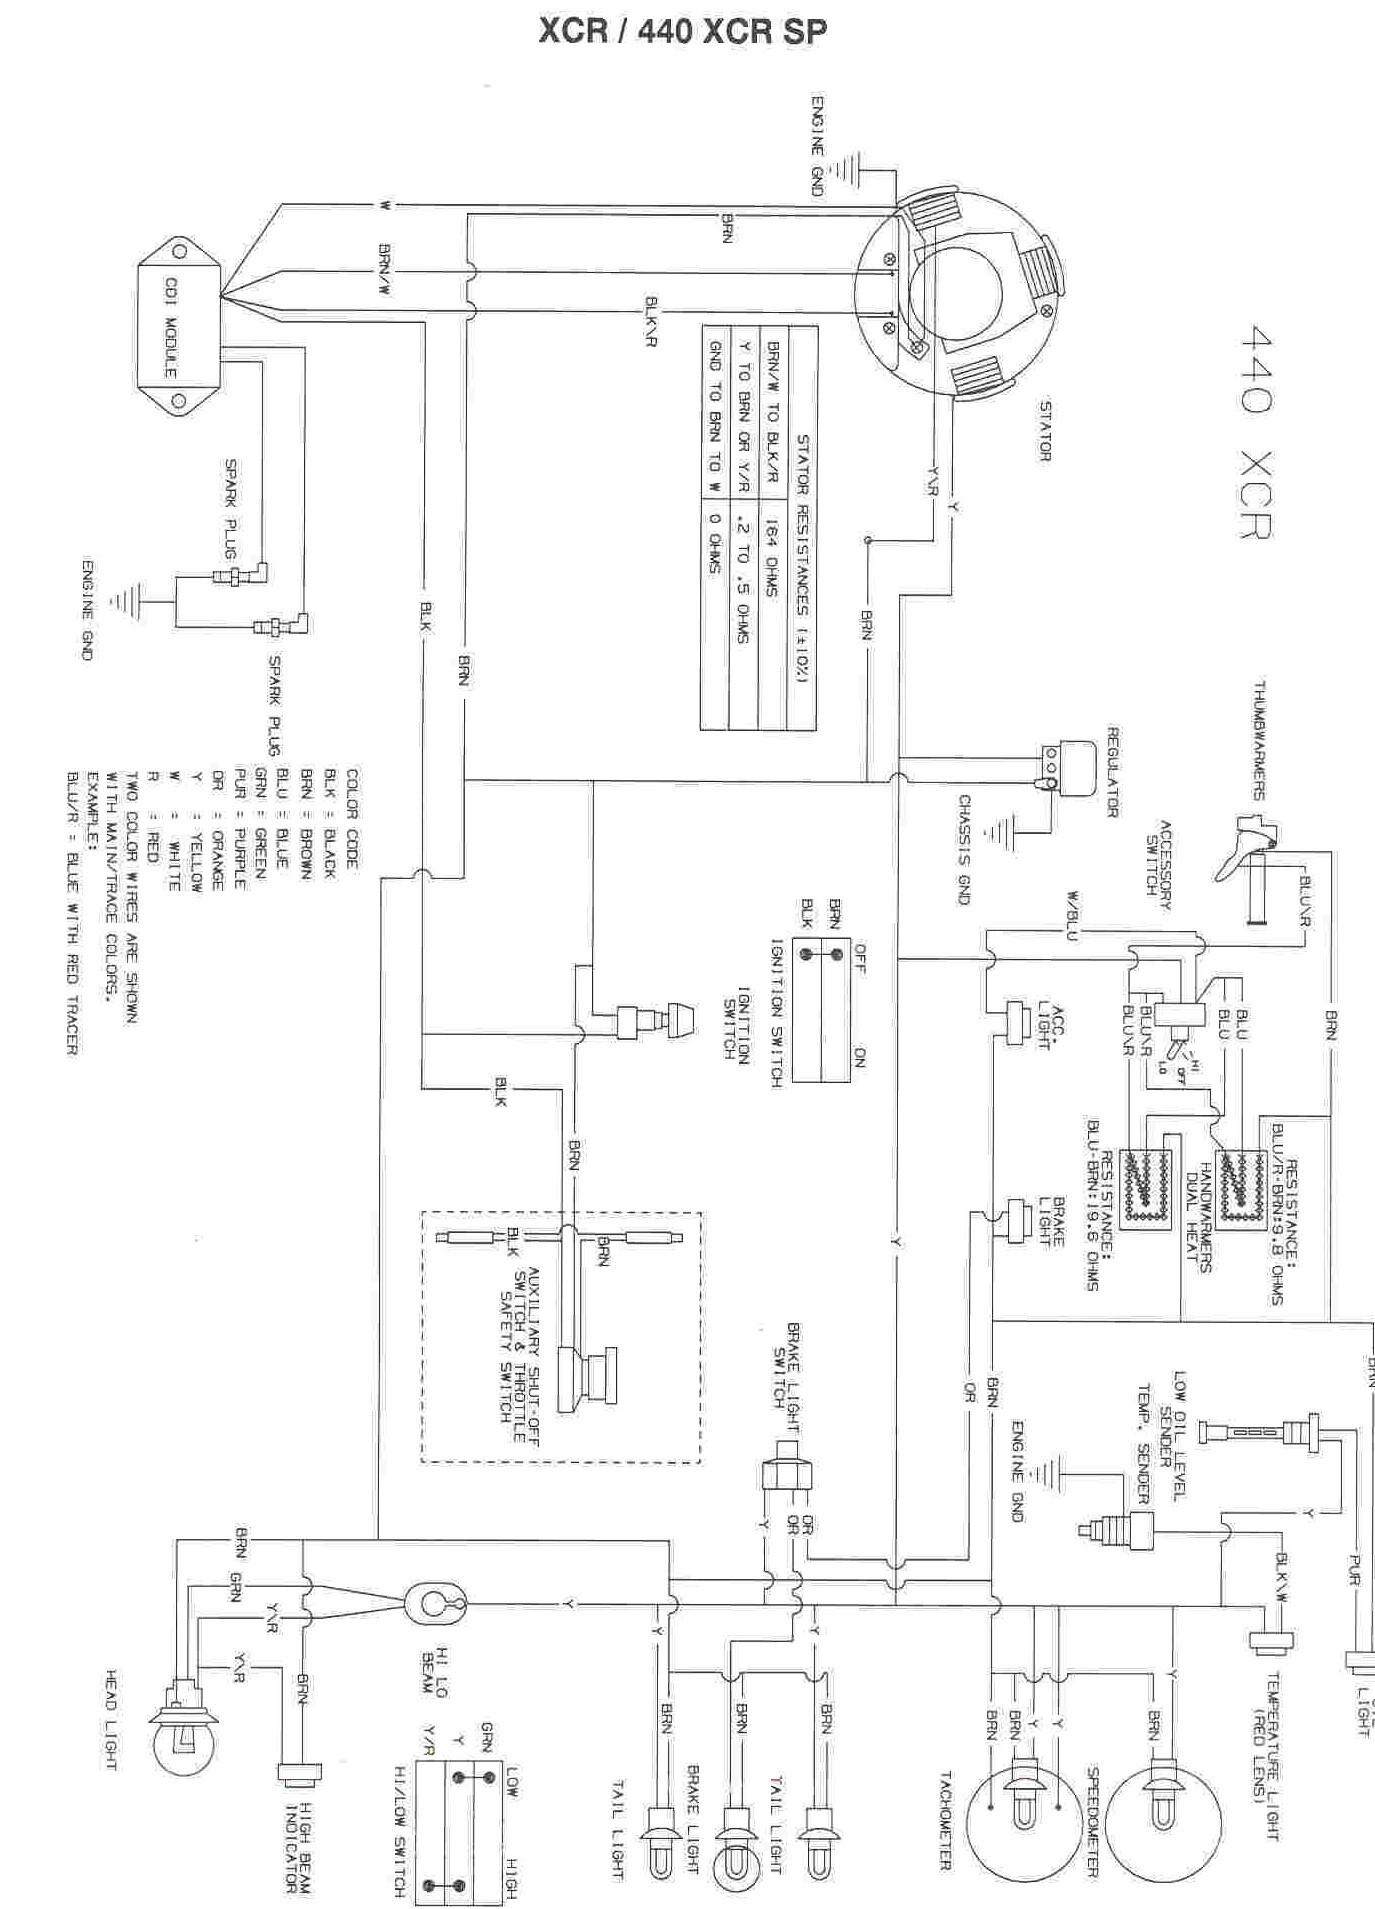 Dayton Hvac Motor 4m096 Wiring Diagram - Great ddnss de •